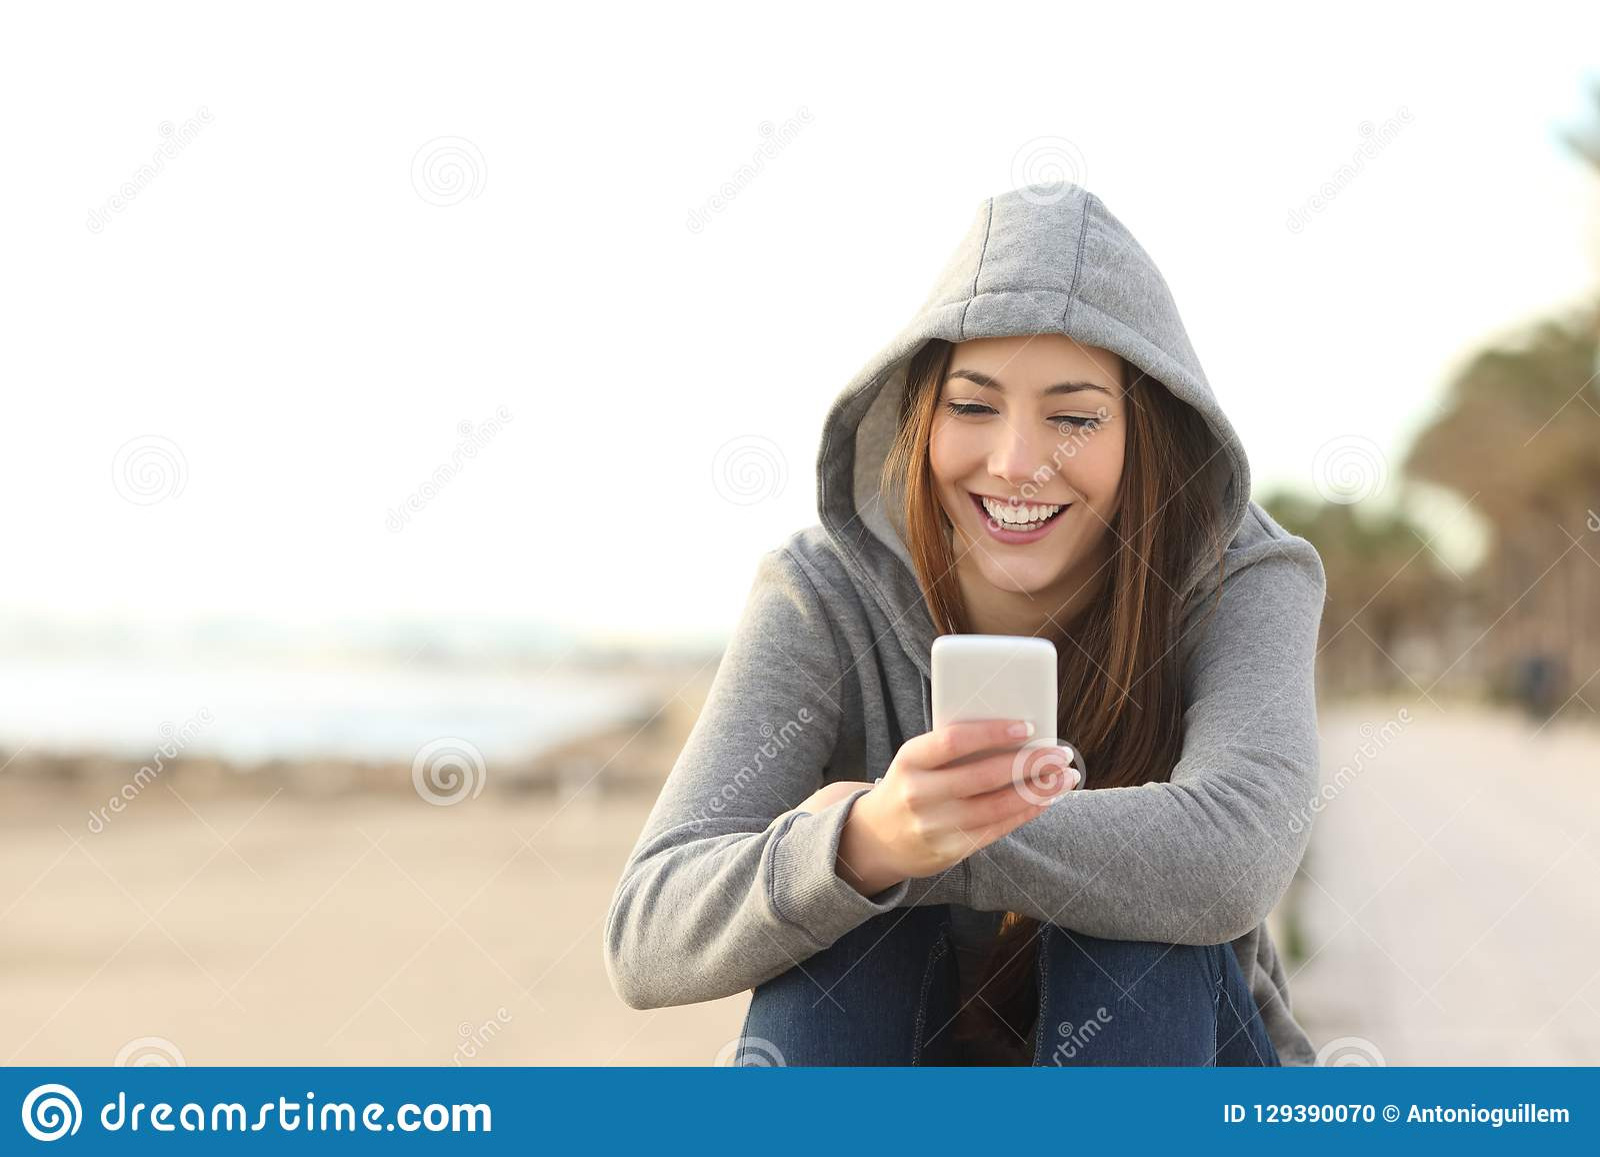 Teenage girl using a smart phone on the beach